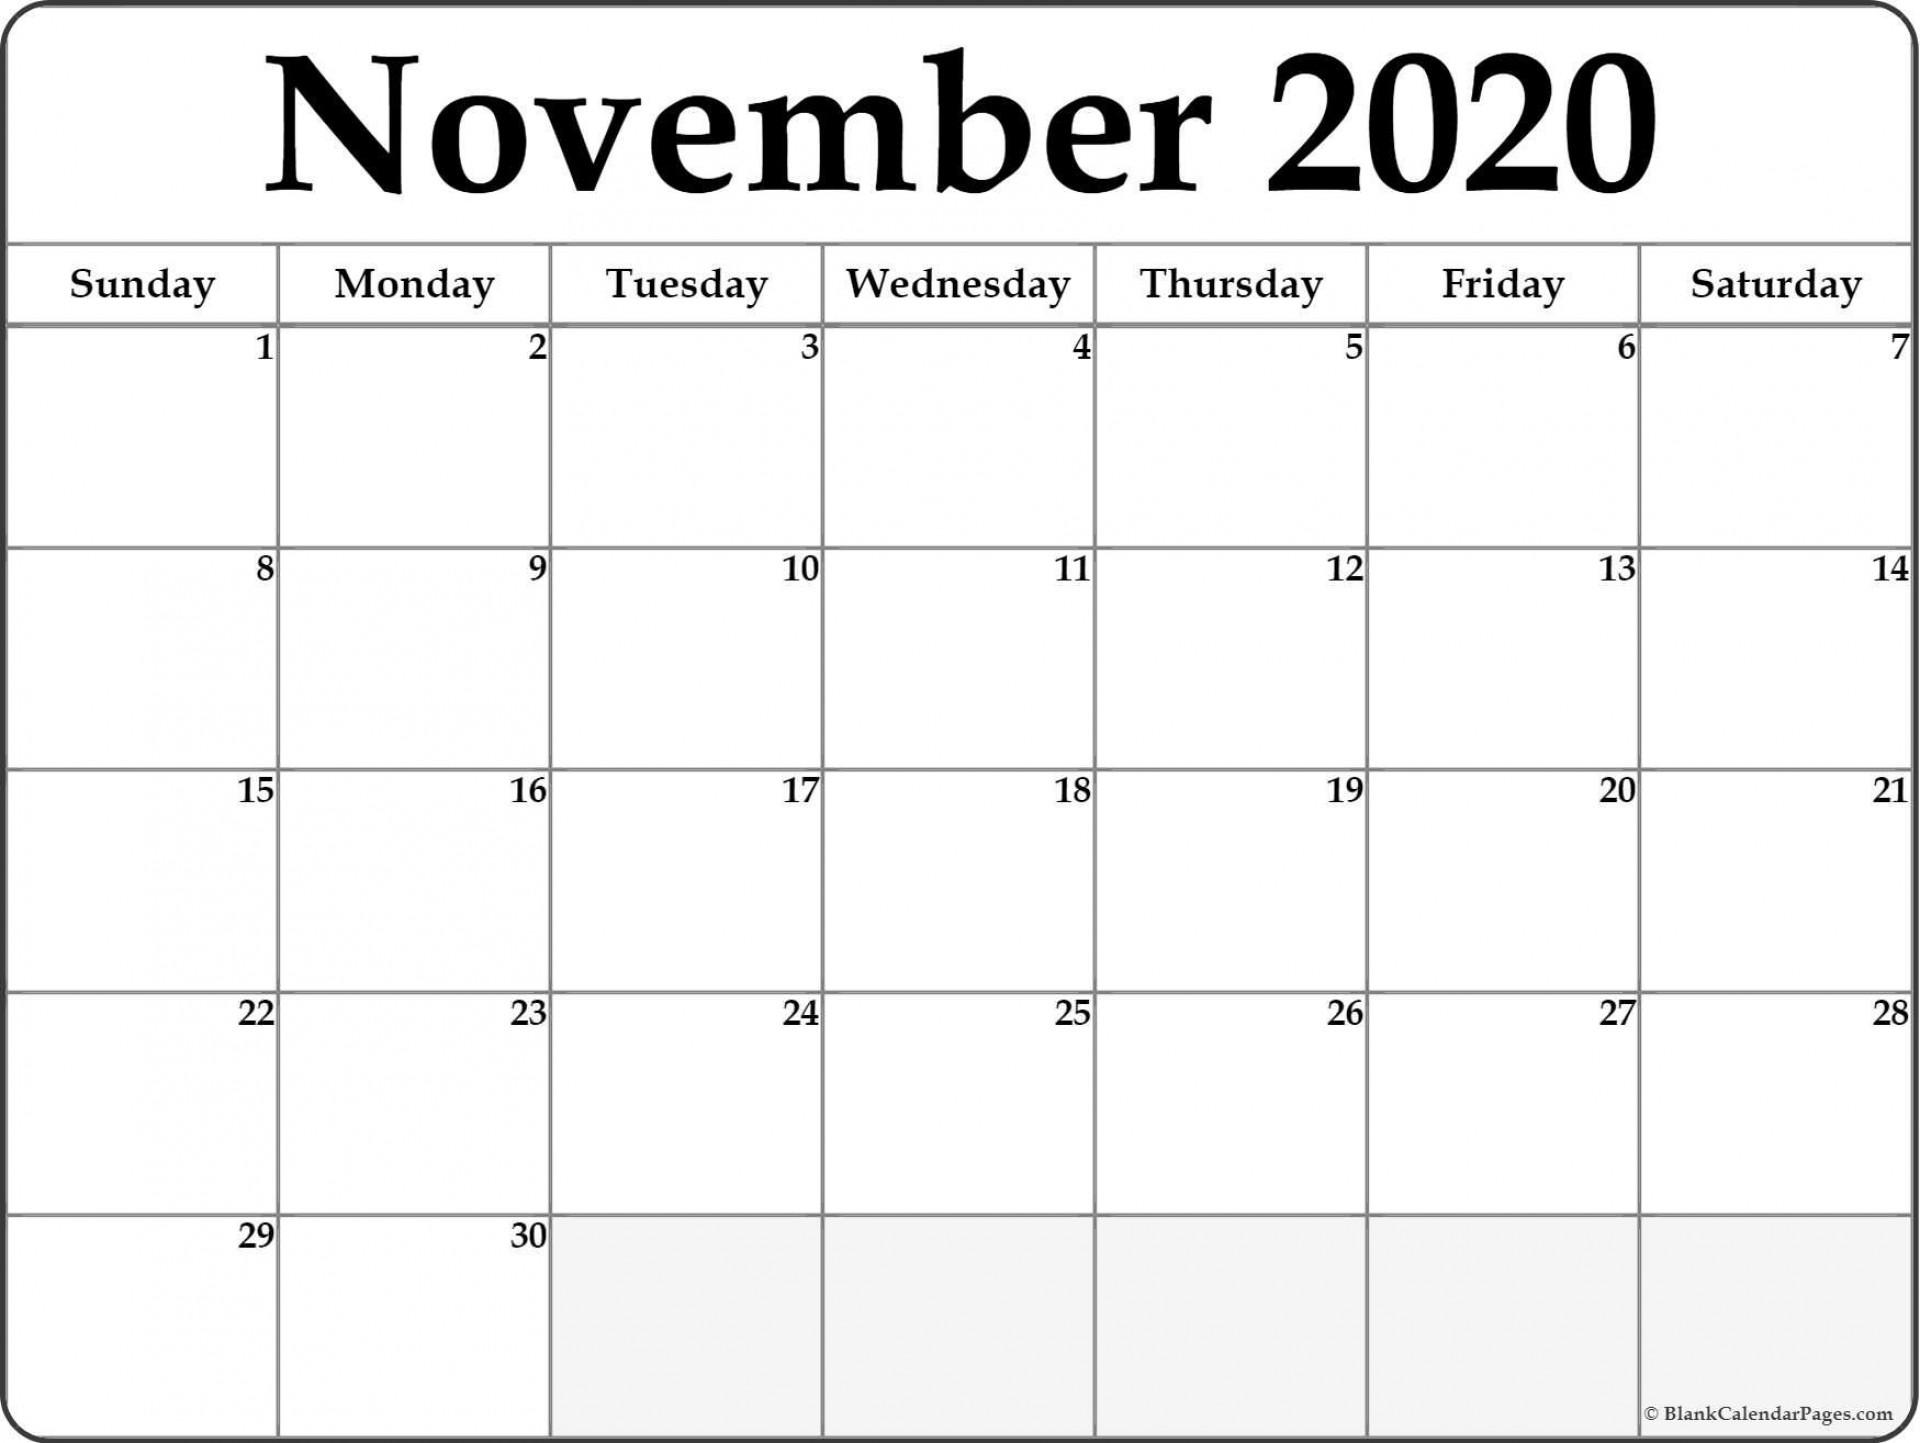 006 Outstanding Printable Calendar Template November 2020 Image  Free1920